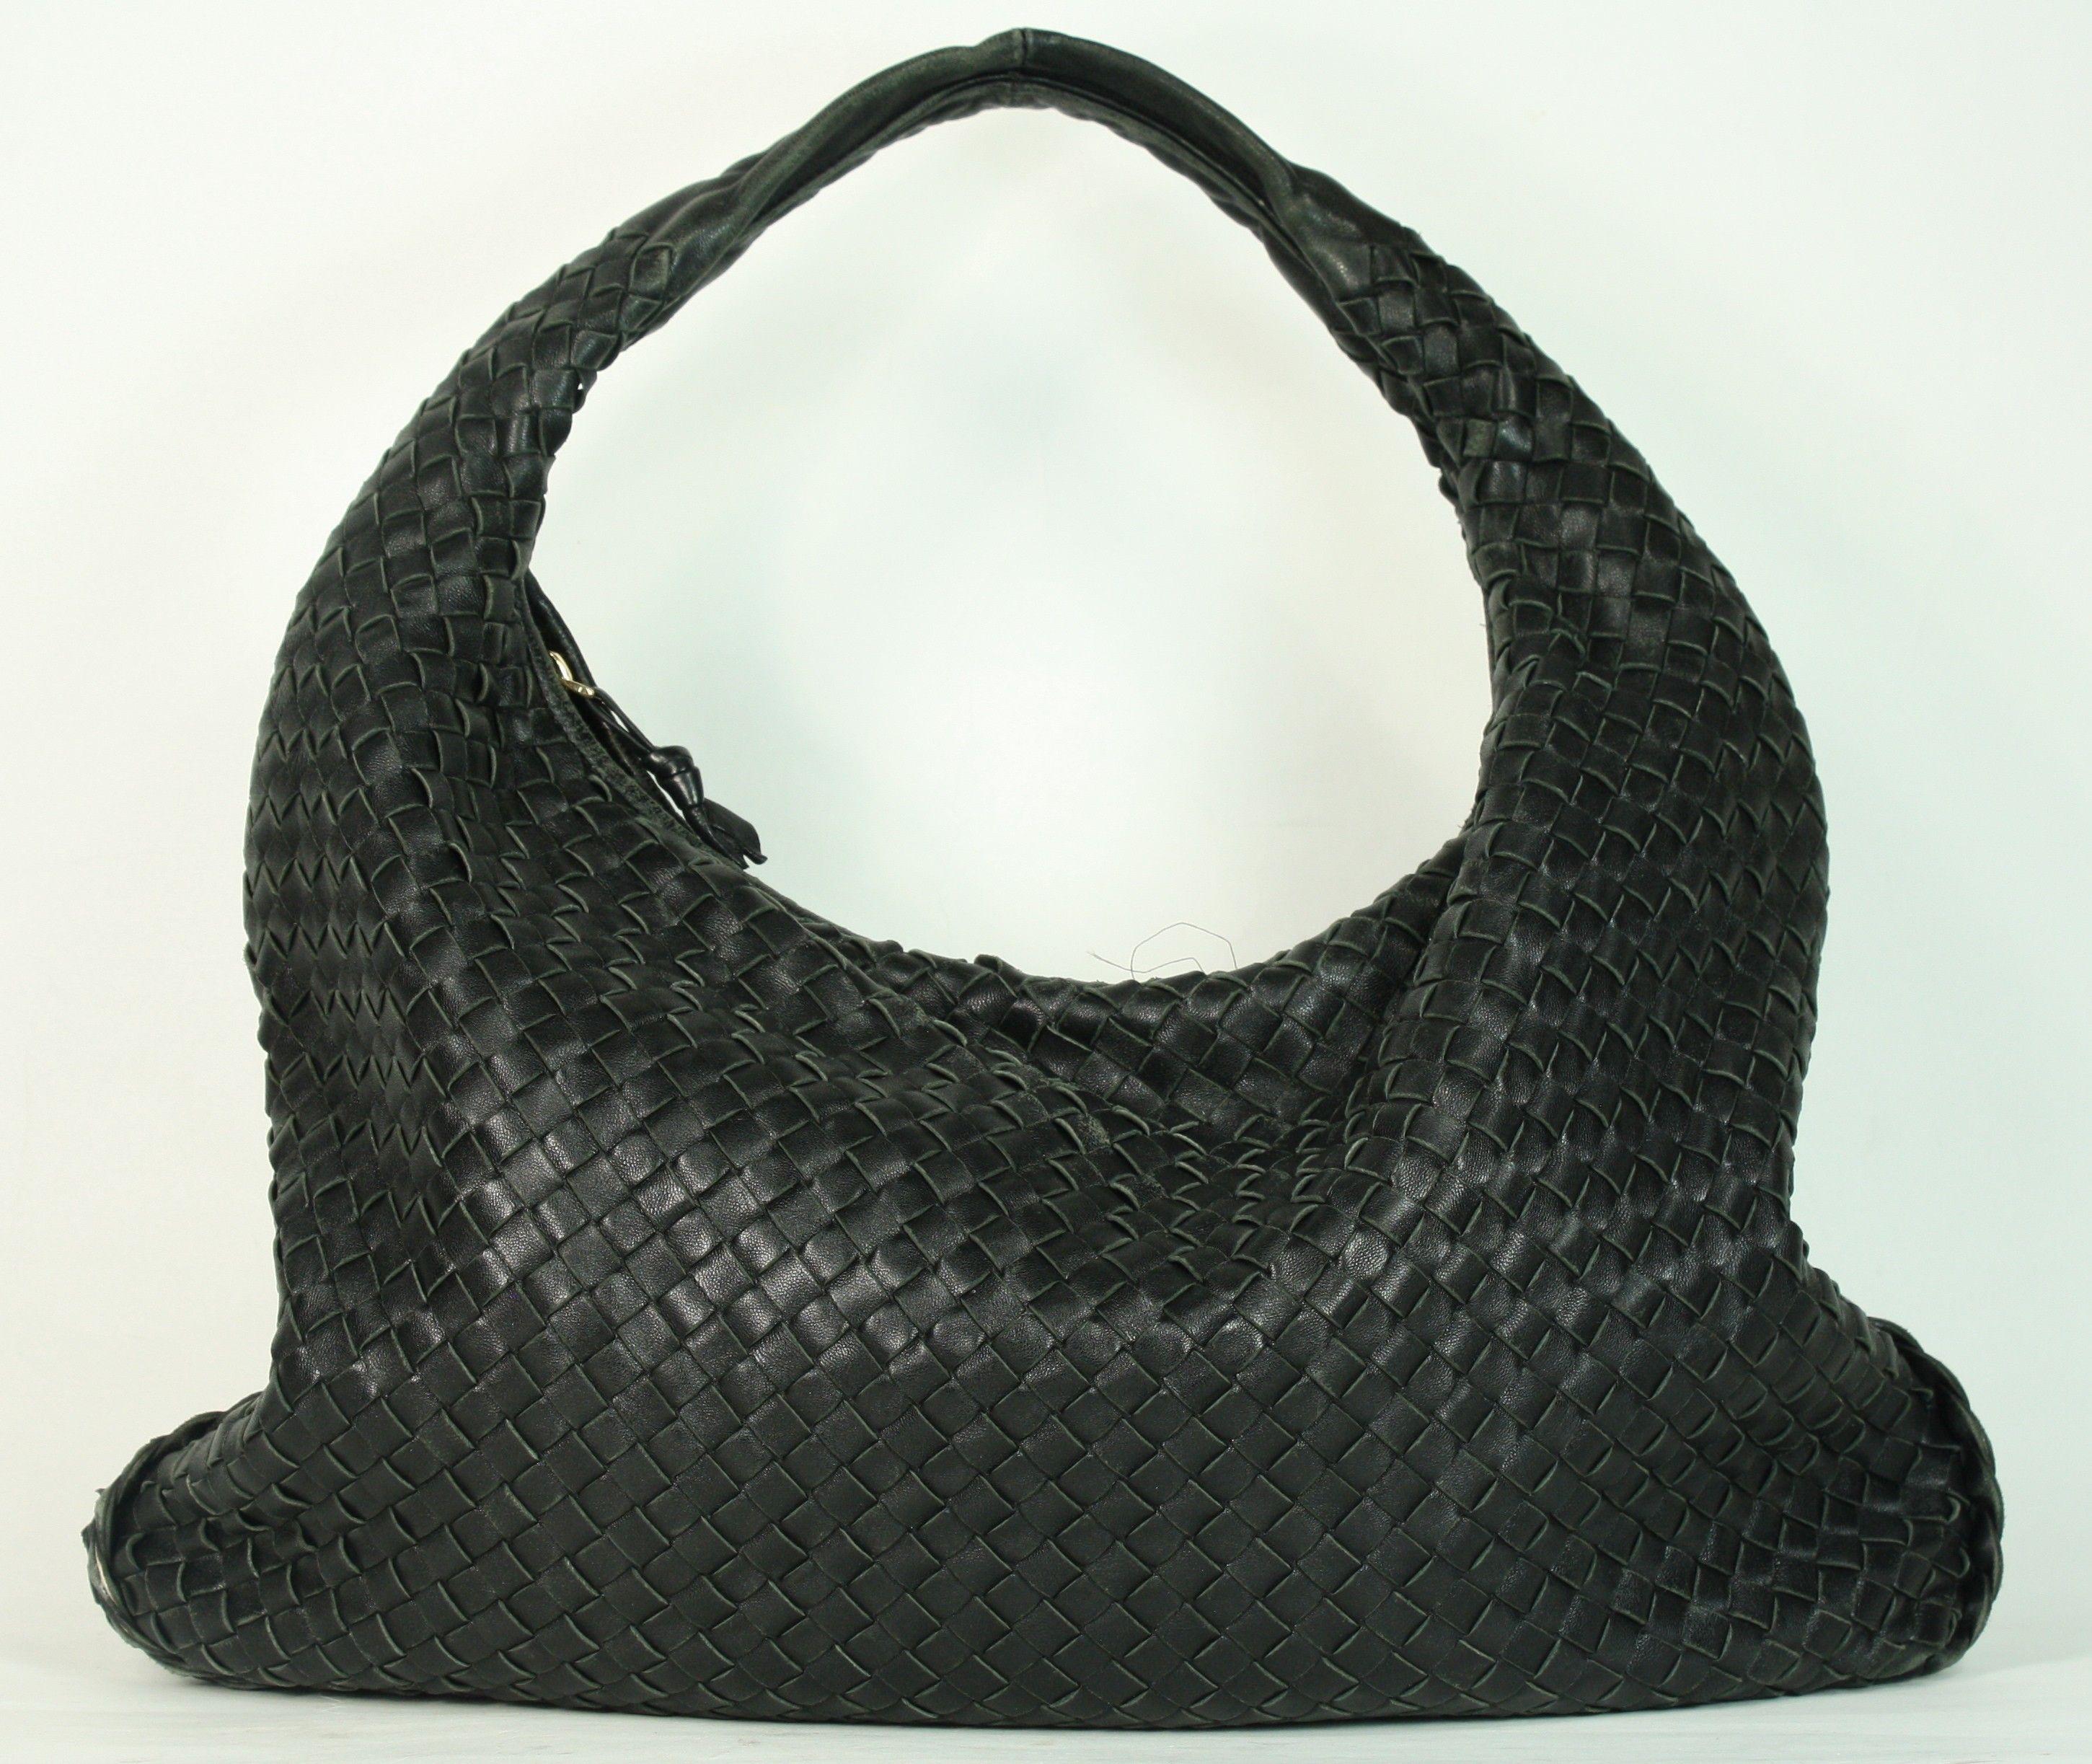 Bottega Veneta Handbags and Purses - PurseBlog